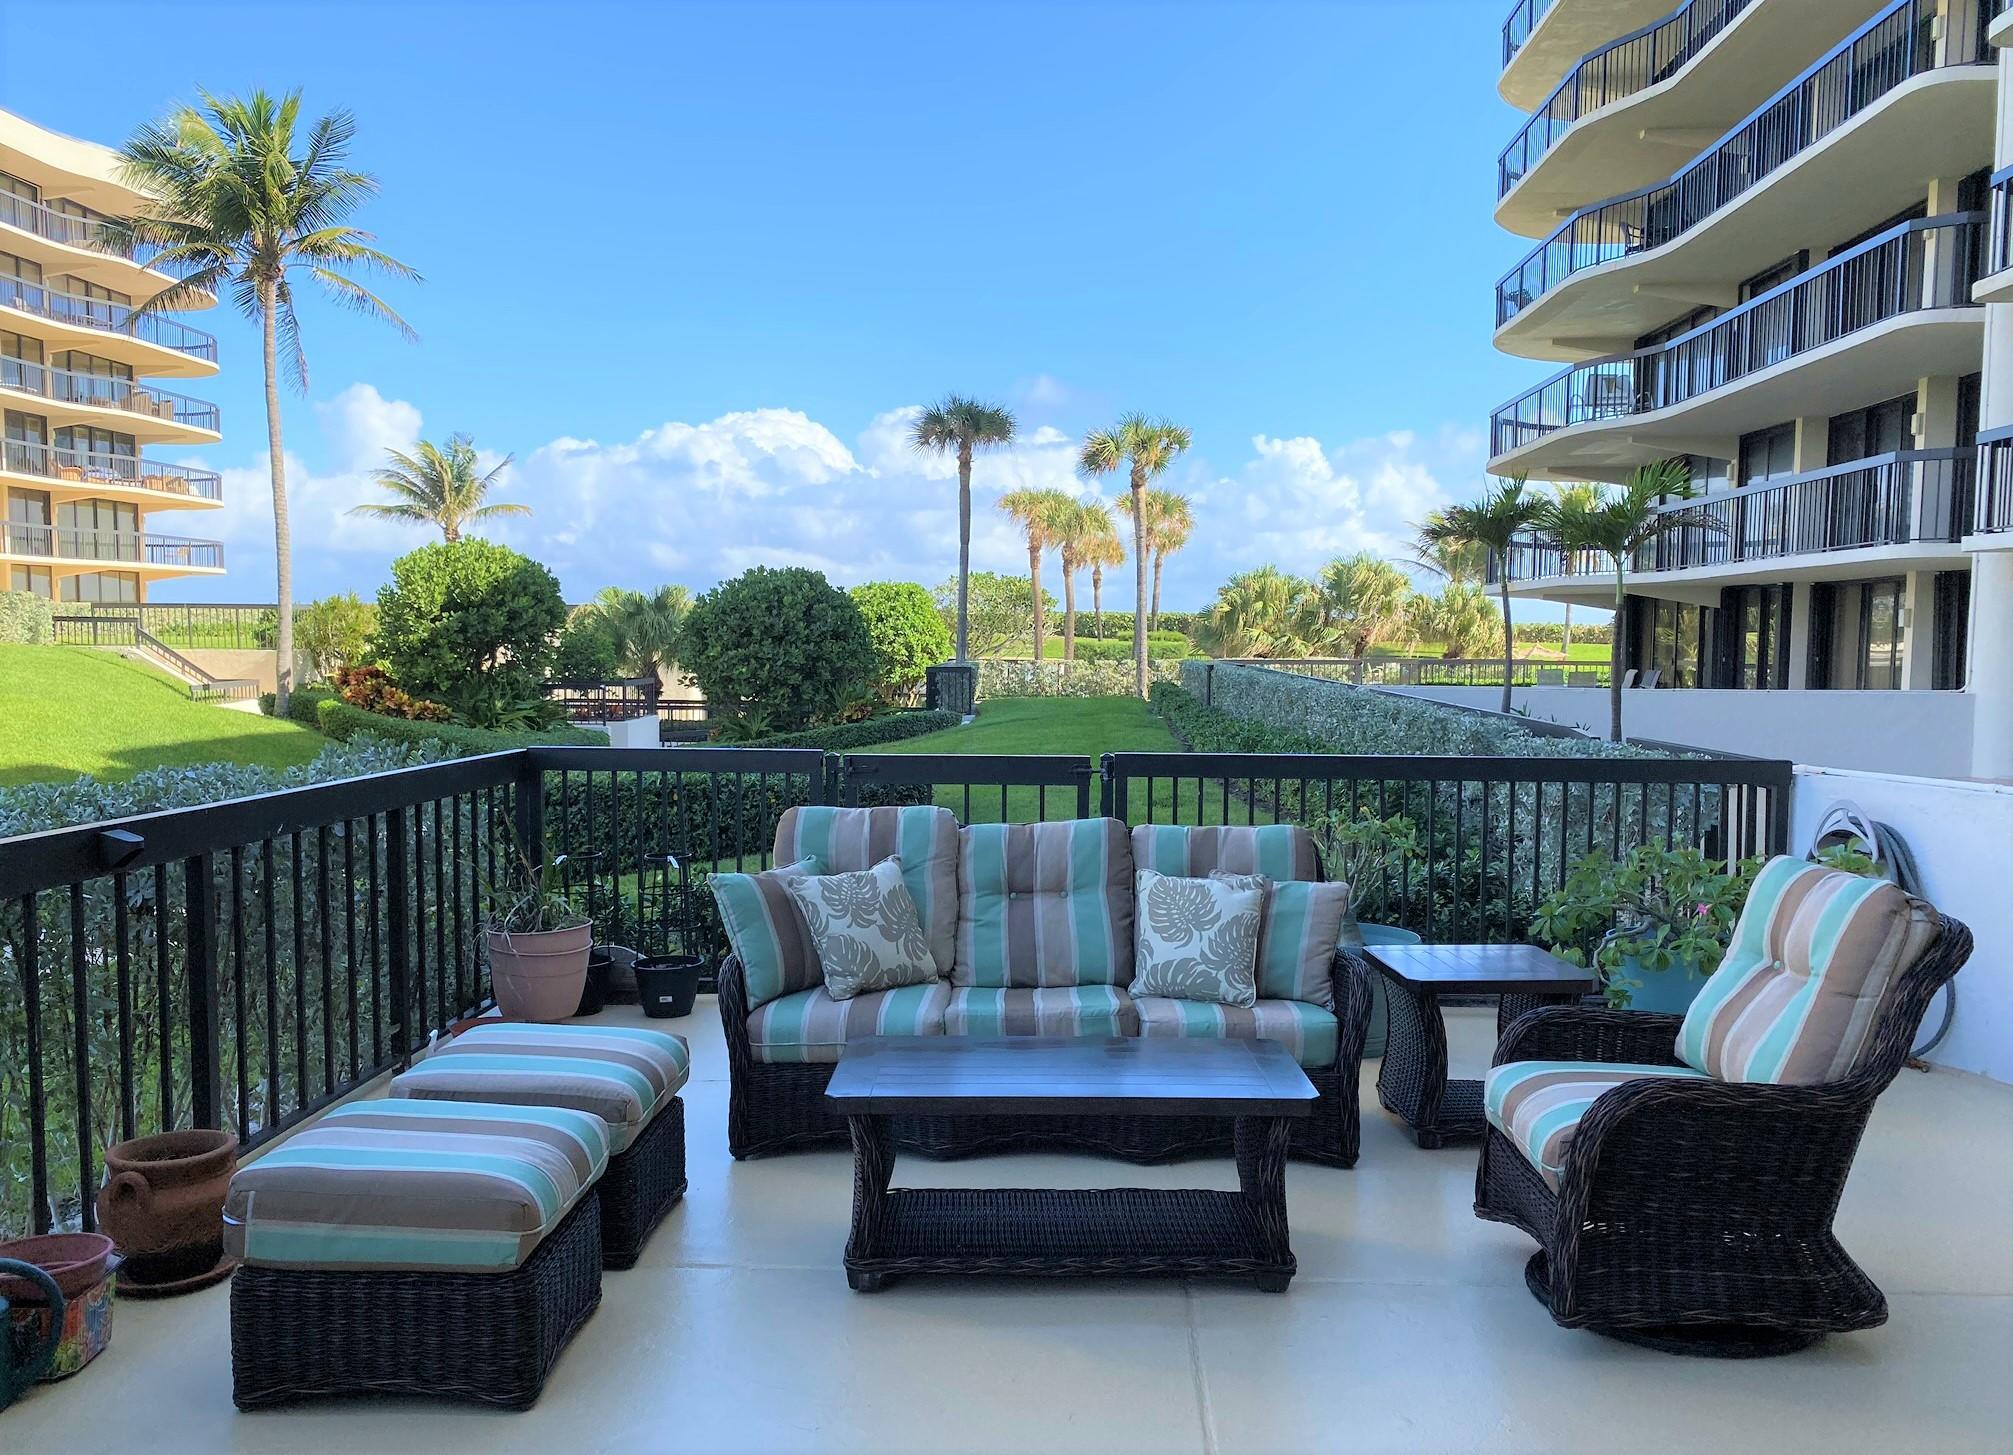 3440 S Ocean Boulevard, 105s - Palm Beach, Florida